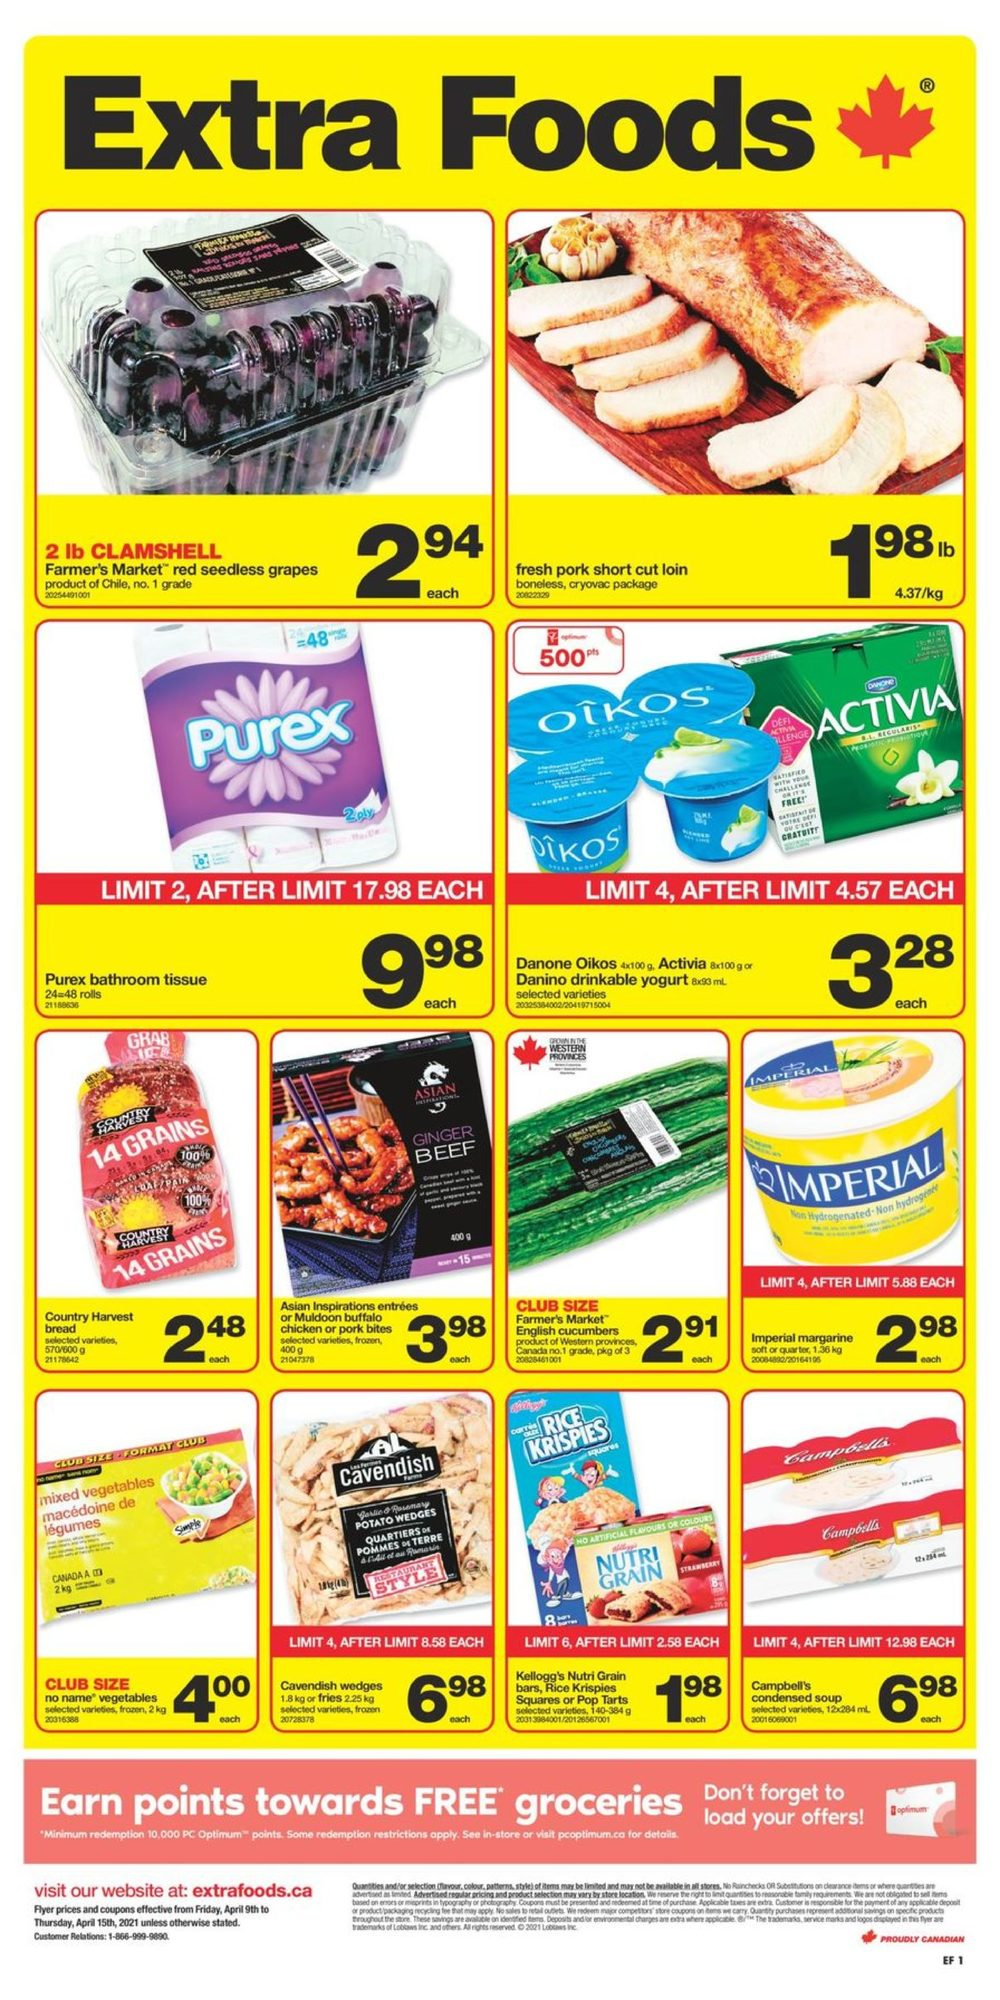 Extra Foods - Weekly Flyer Specials